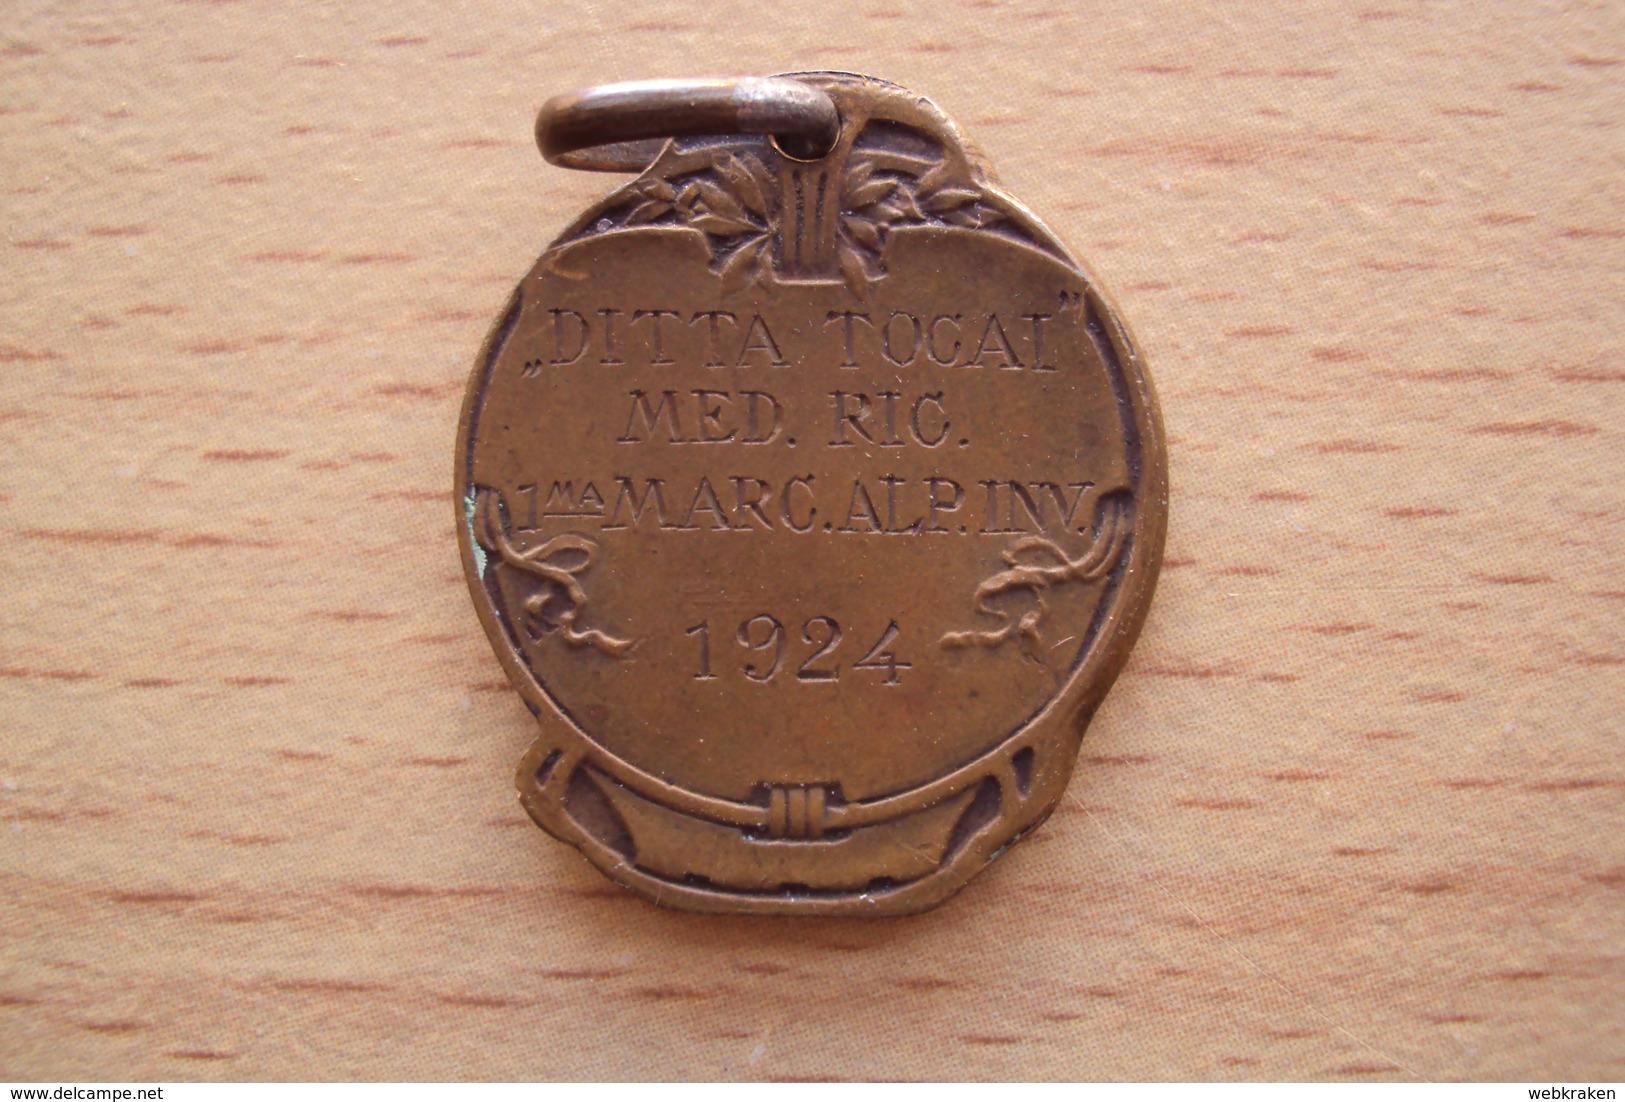 ITALY VINTAGE OLD MEDALS VECCHIA MEDAGLIA FRIULI VENEZIA GIULIA DITTA TOCAI 1a MARCIA ALPINA 1924  DIAMETRO CM. 2 - Altri